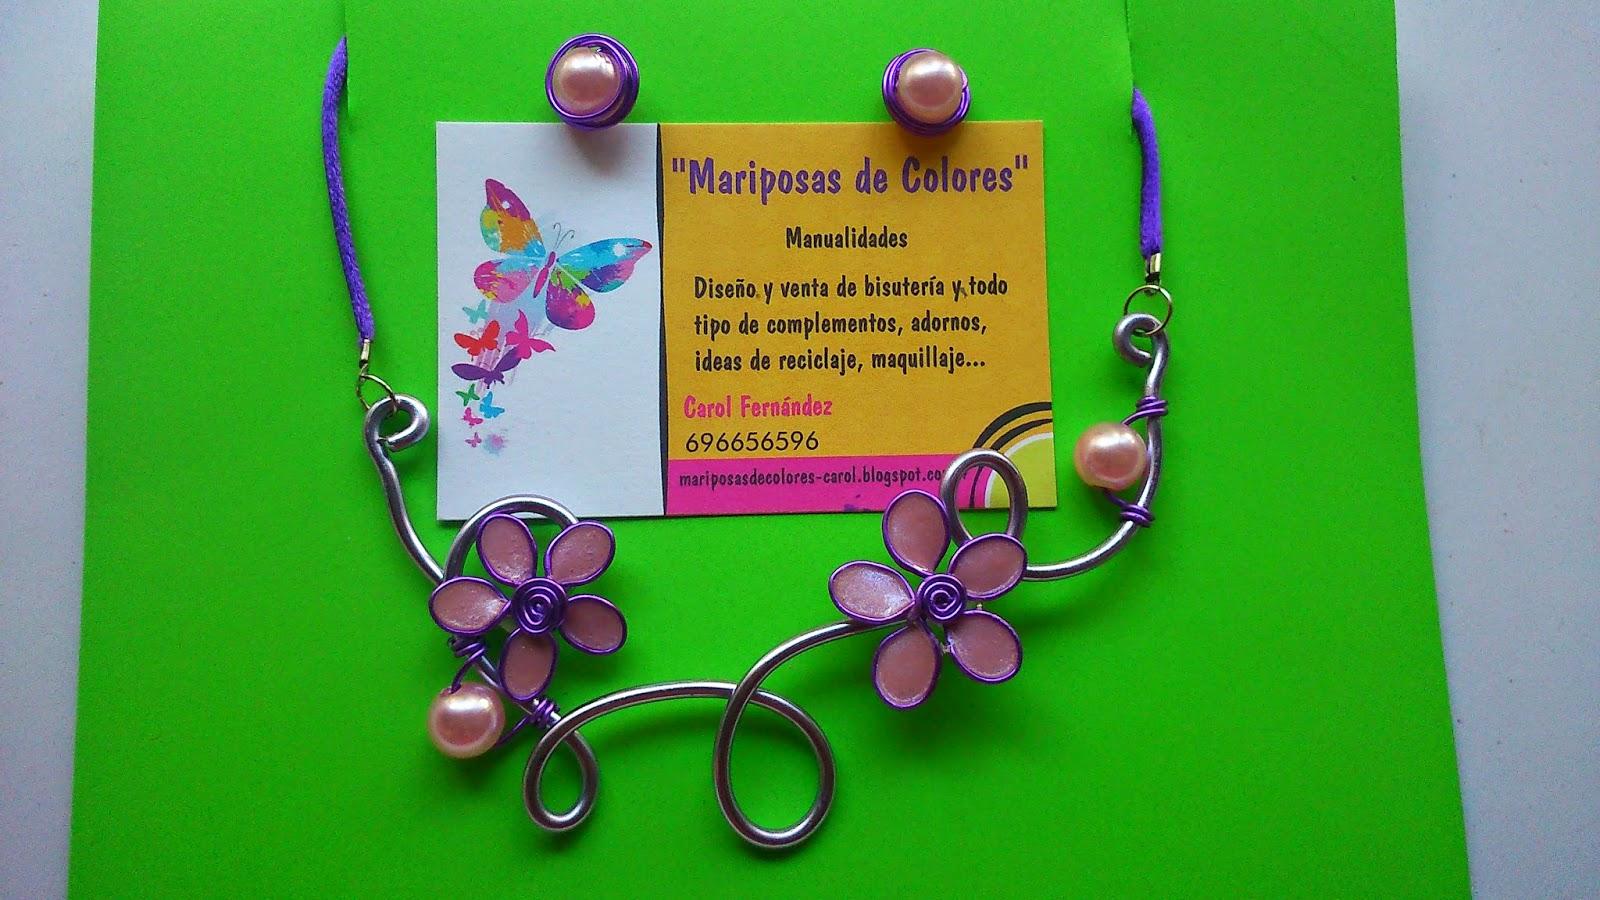 Mariposas de Colores Manualidades\